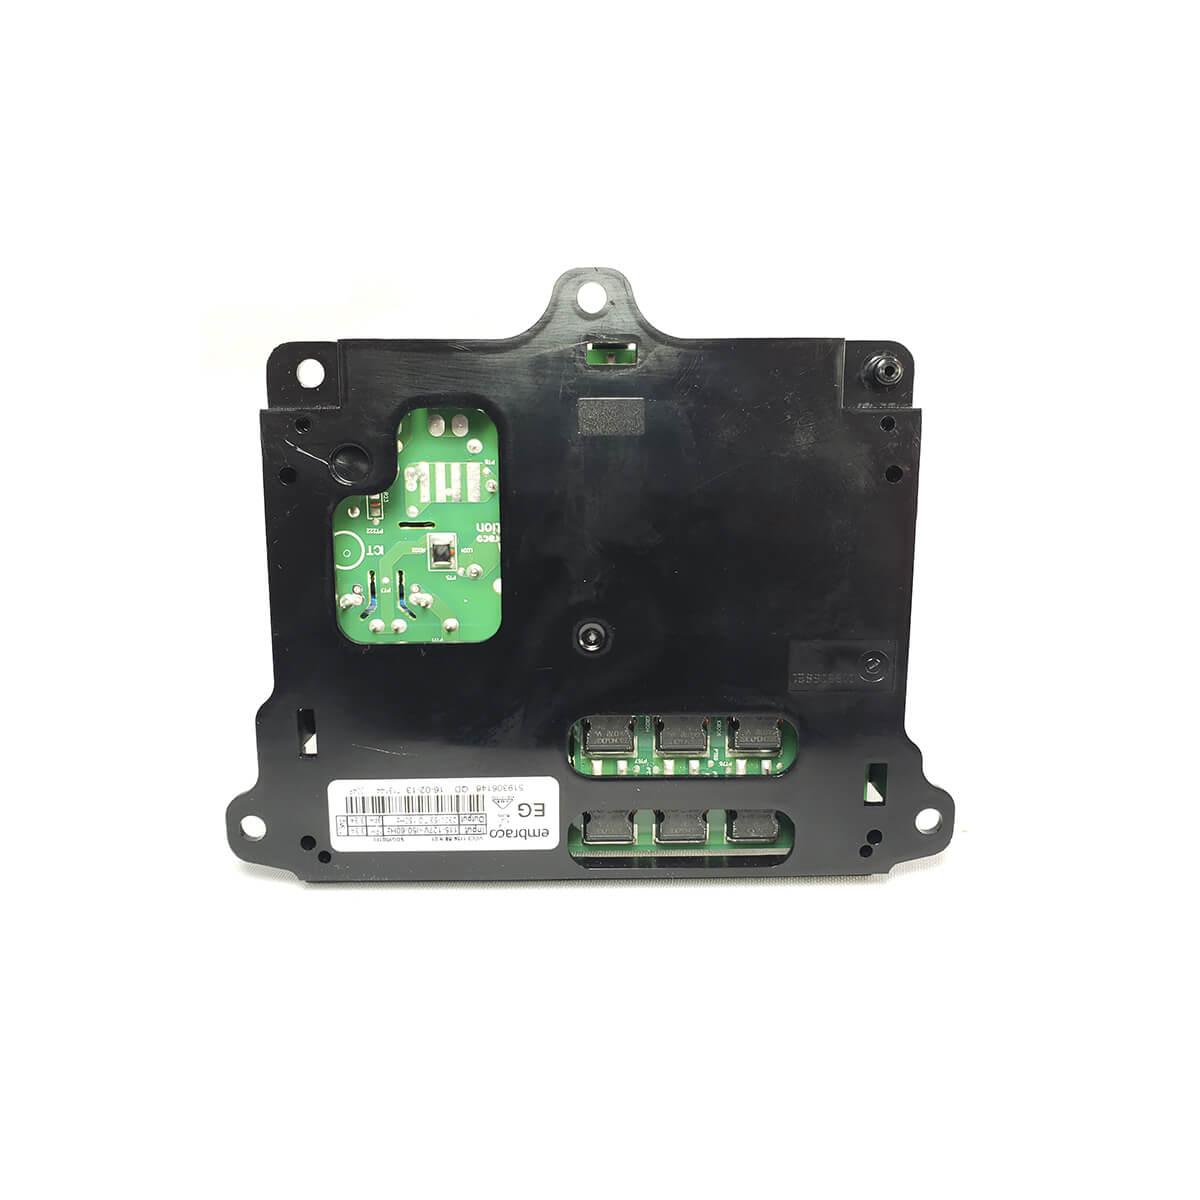 Placa Inversora Para Refrigerador Electrolux FDD80 - A08481701 502301010091